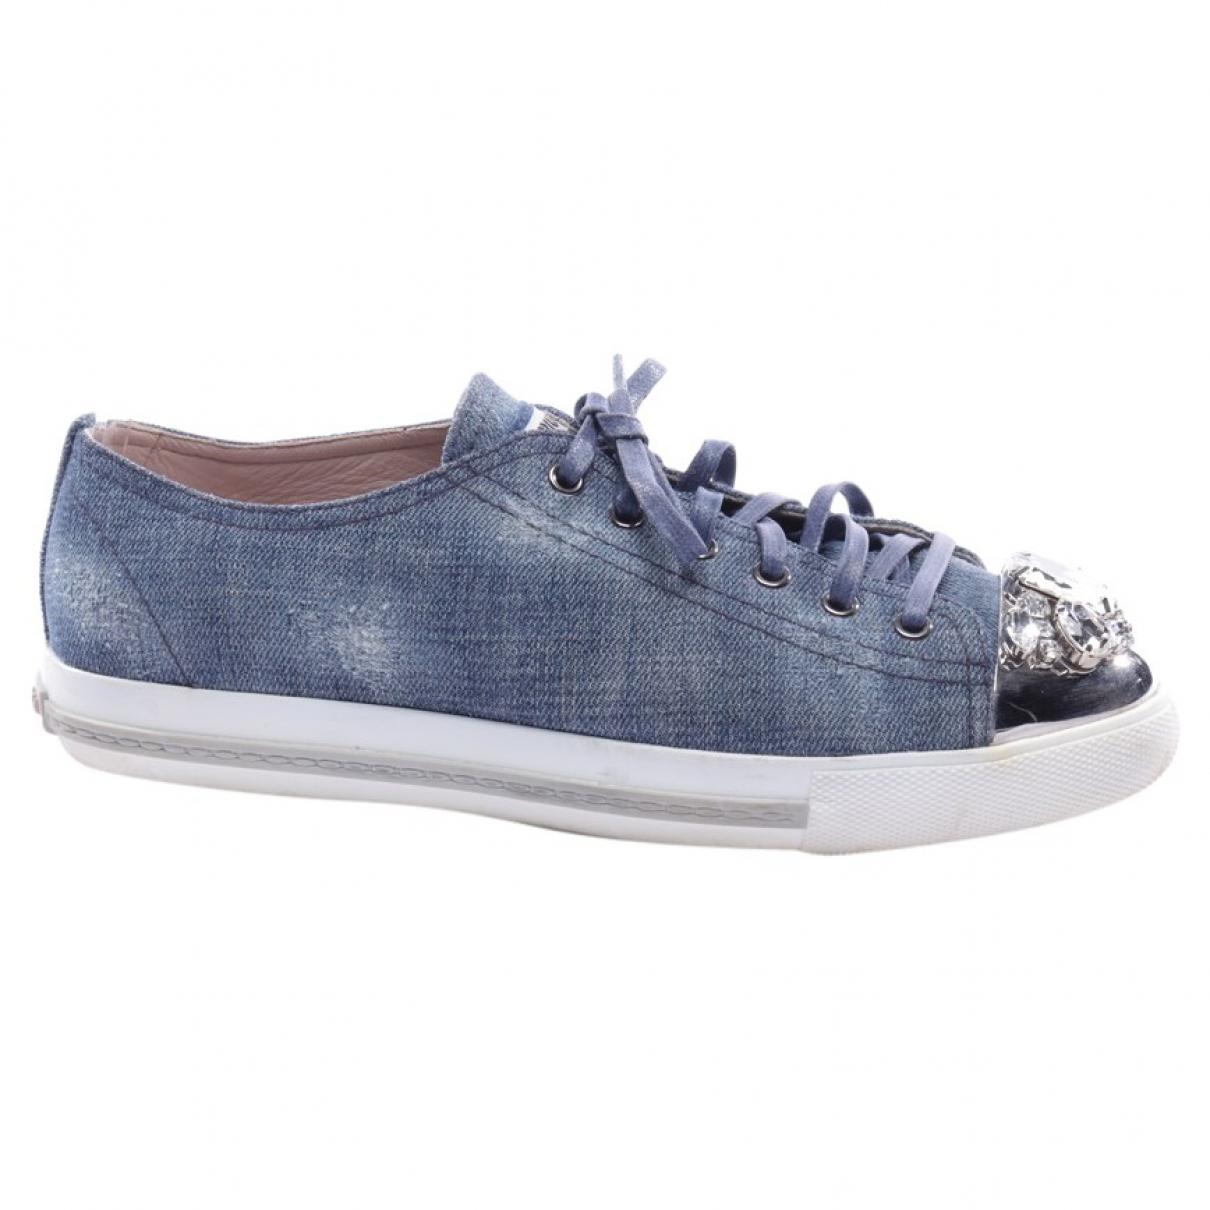 Miu Miu N Blue Leather Flats for Women 41 EU